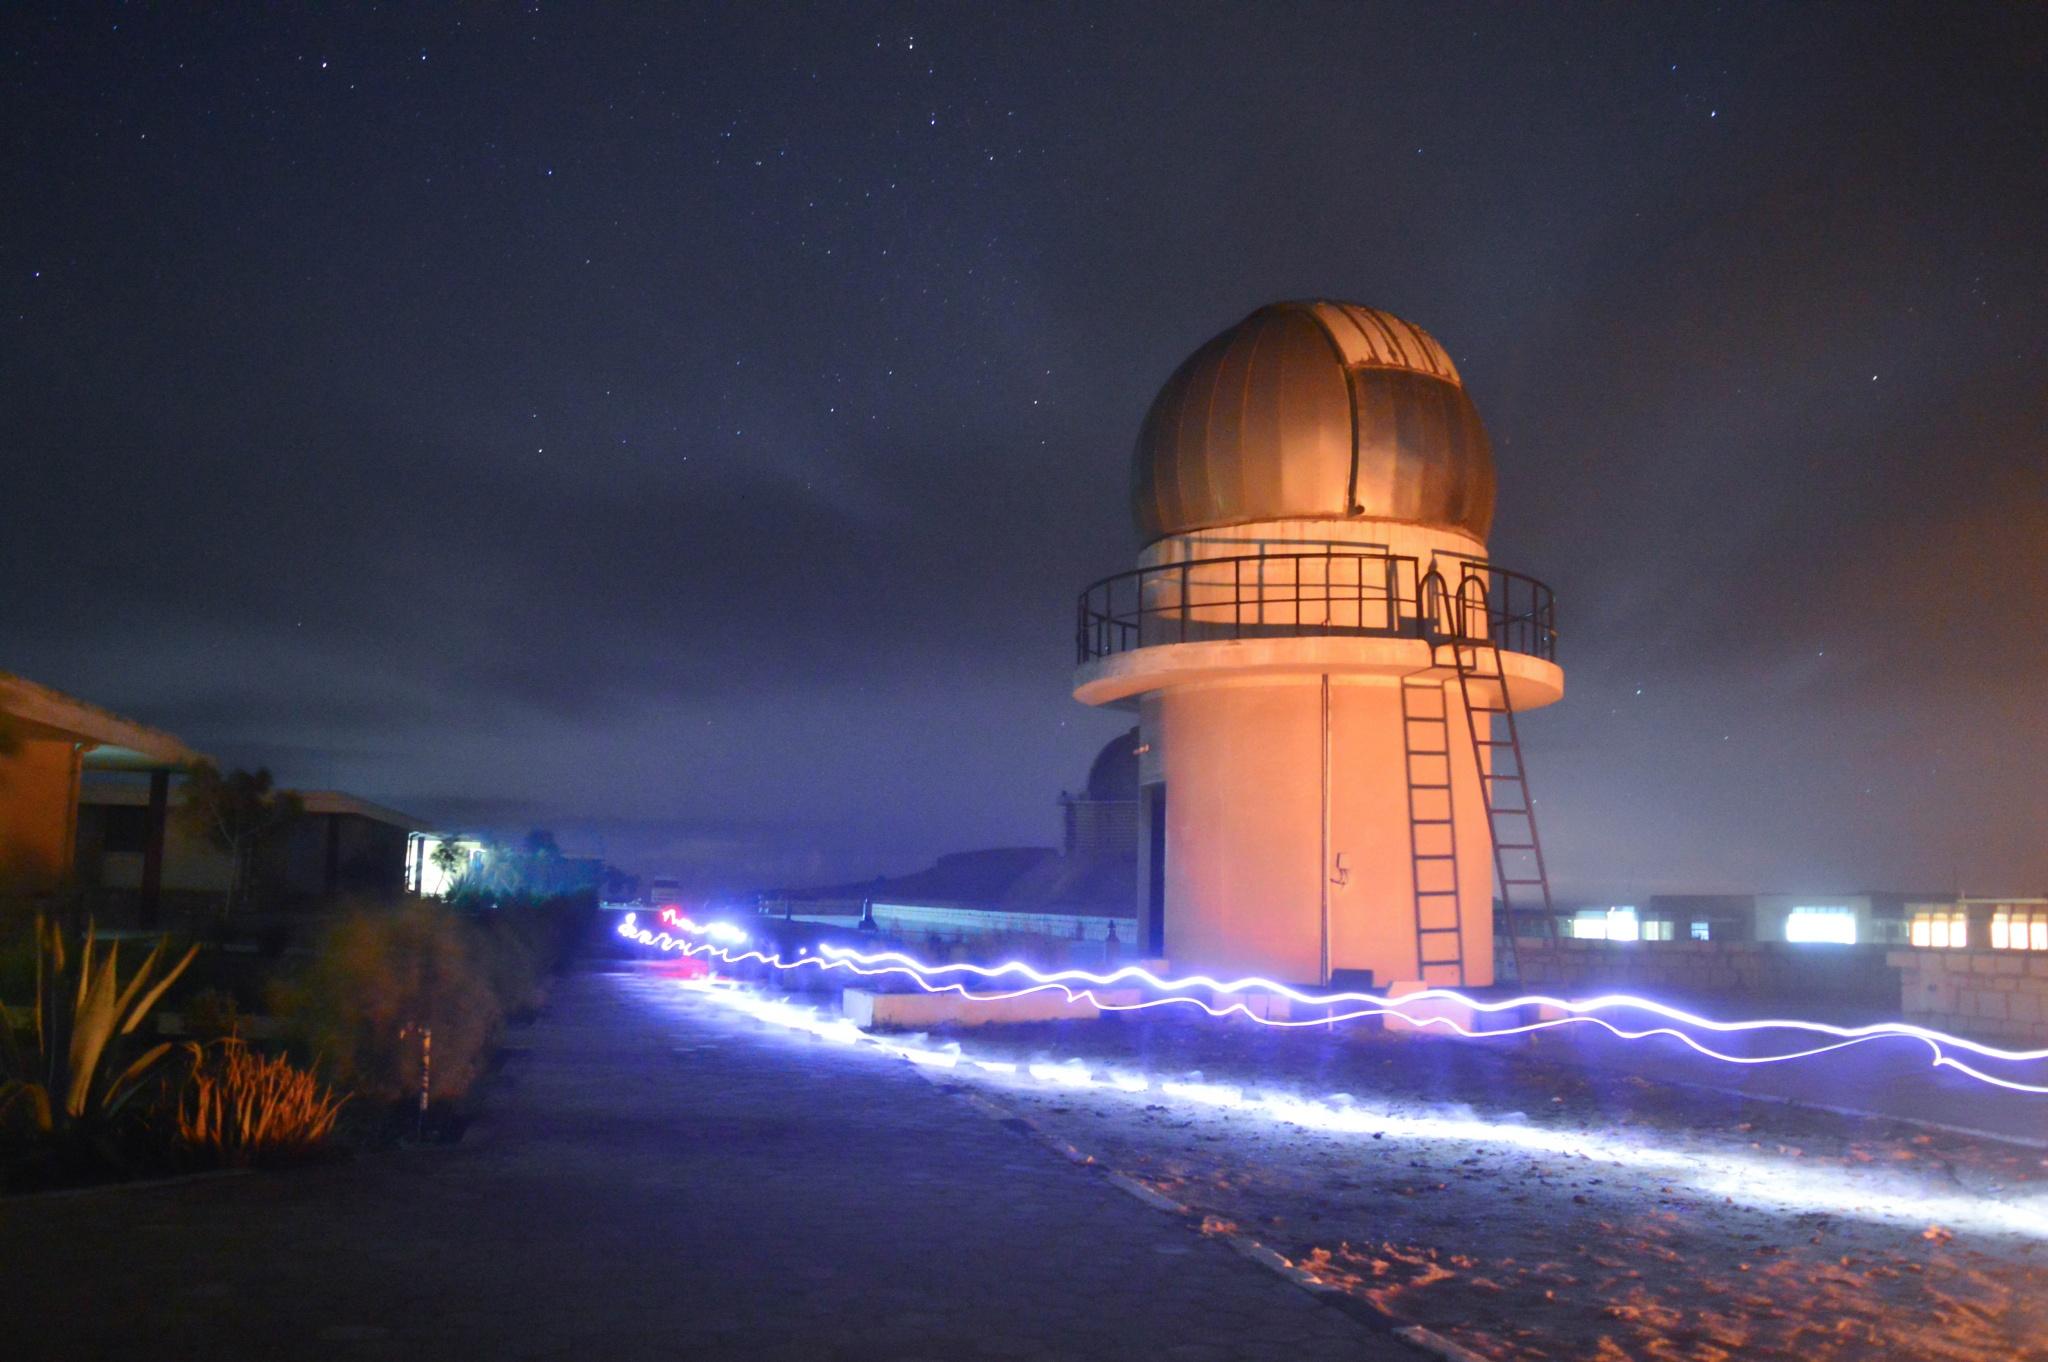 Highlight by Zidan